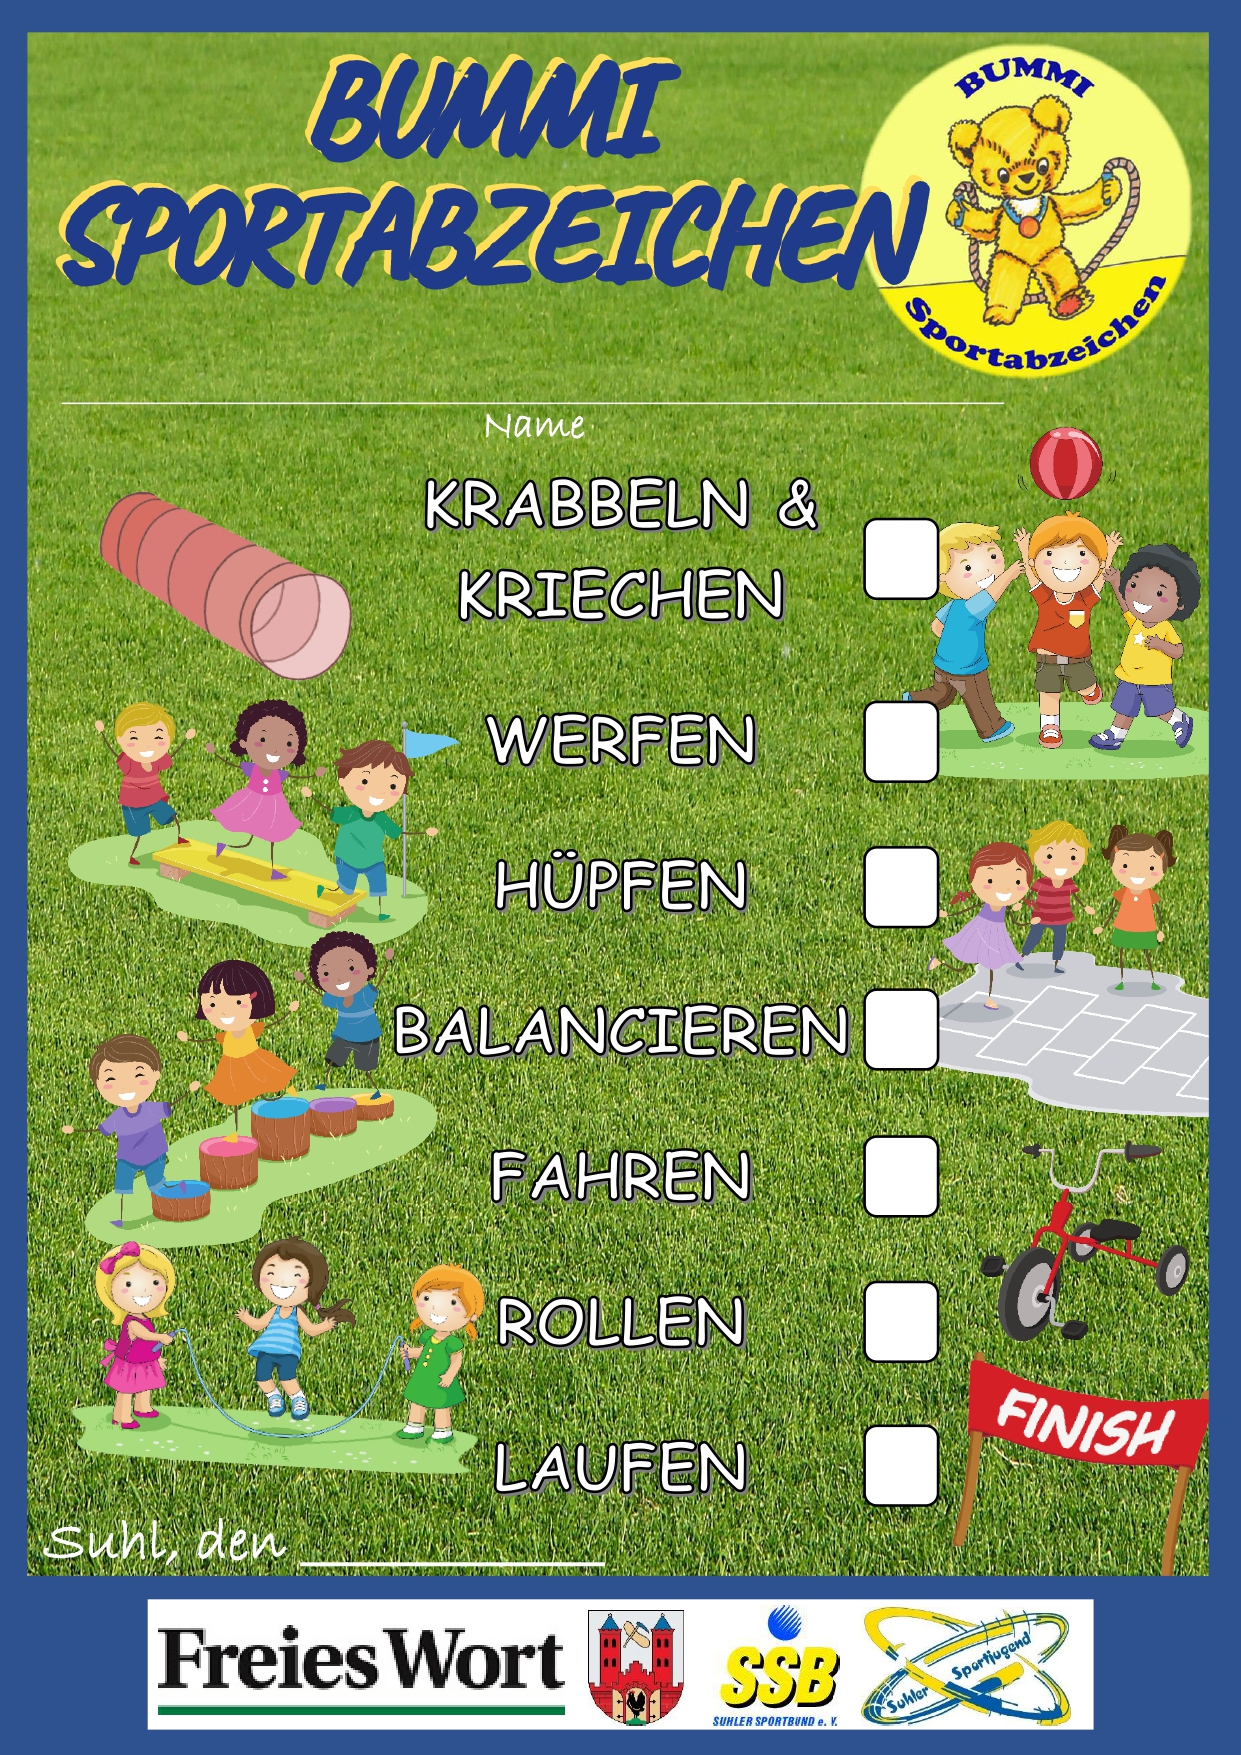 Bummi Sportabzeichen_SHL